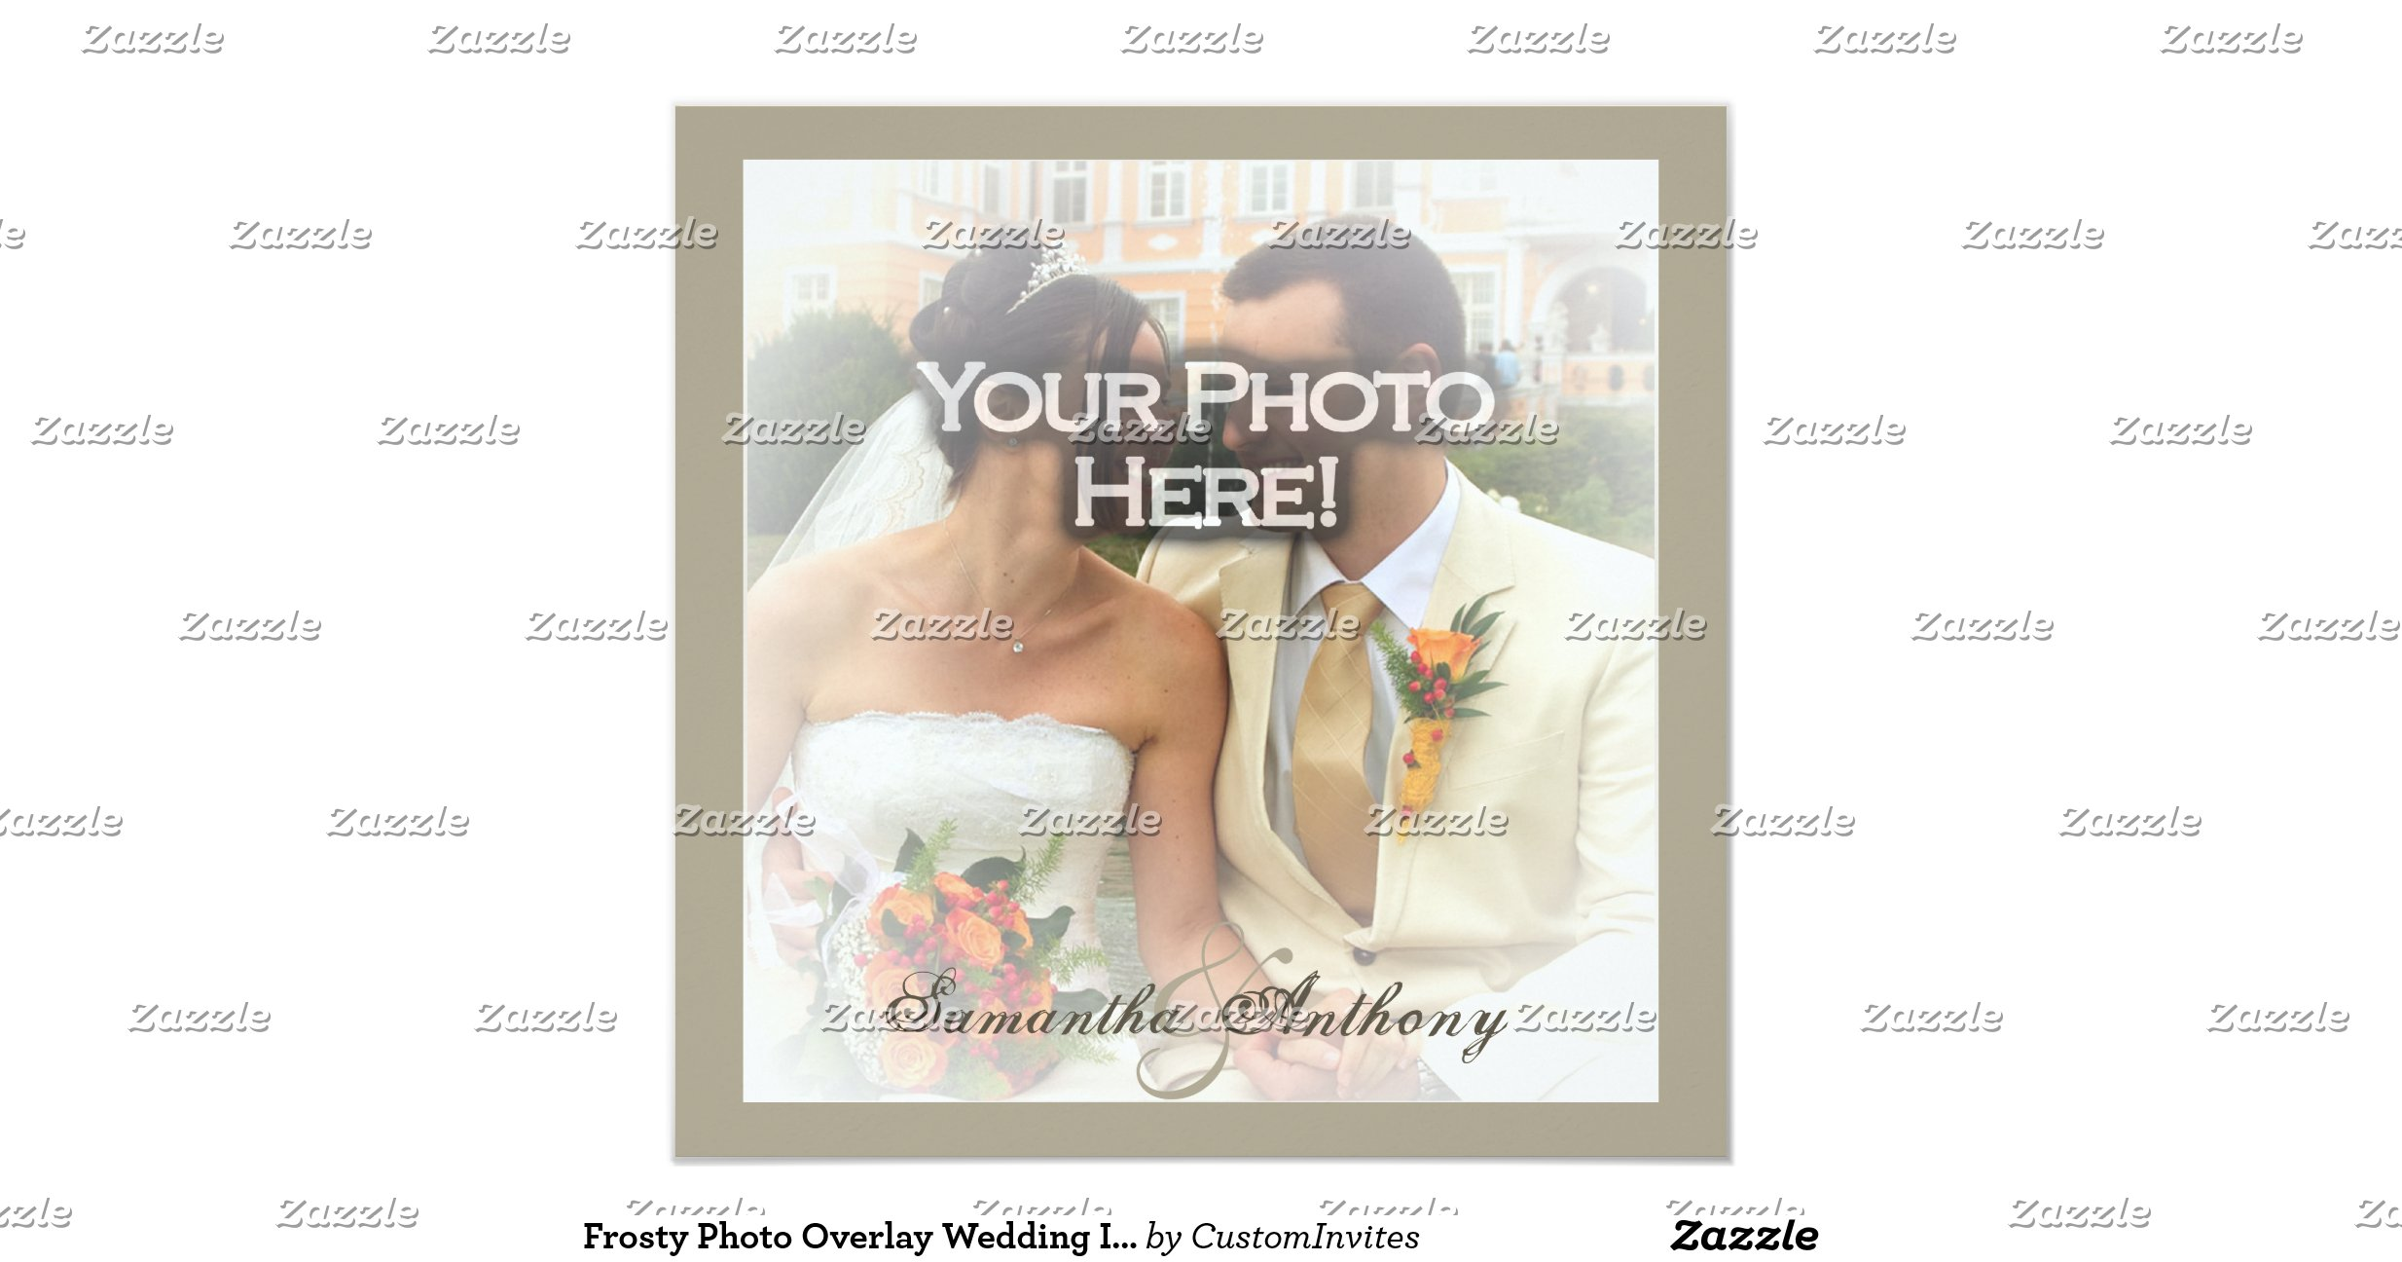 frosty_photo_overlay_wedding_invitations ...